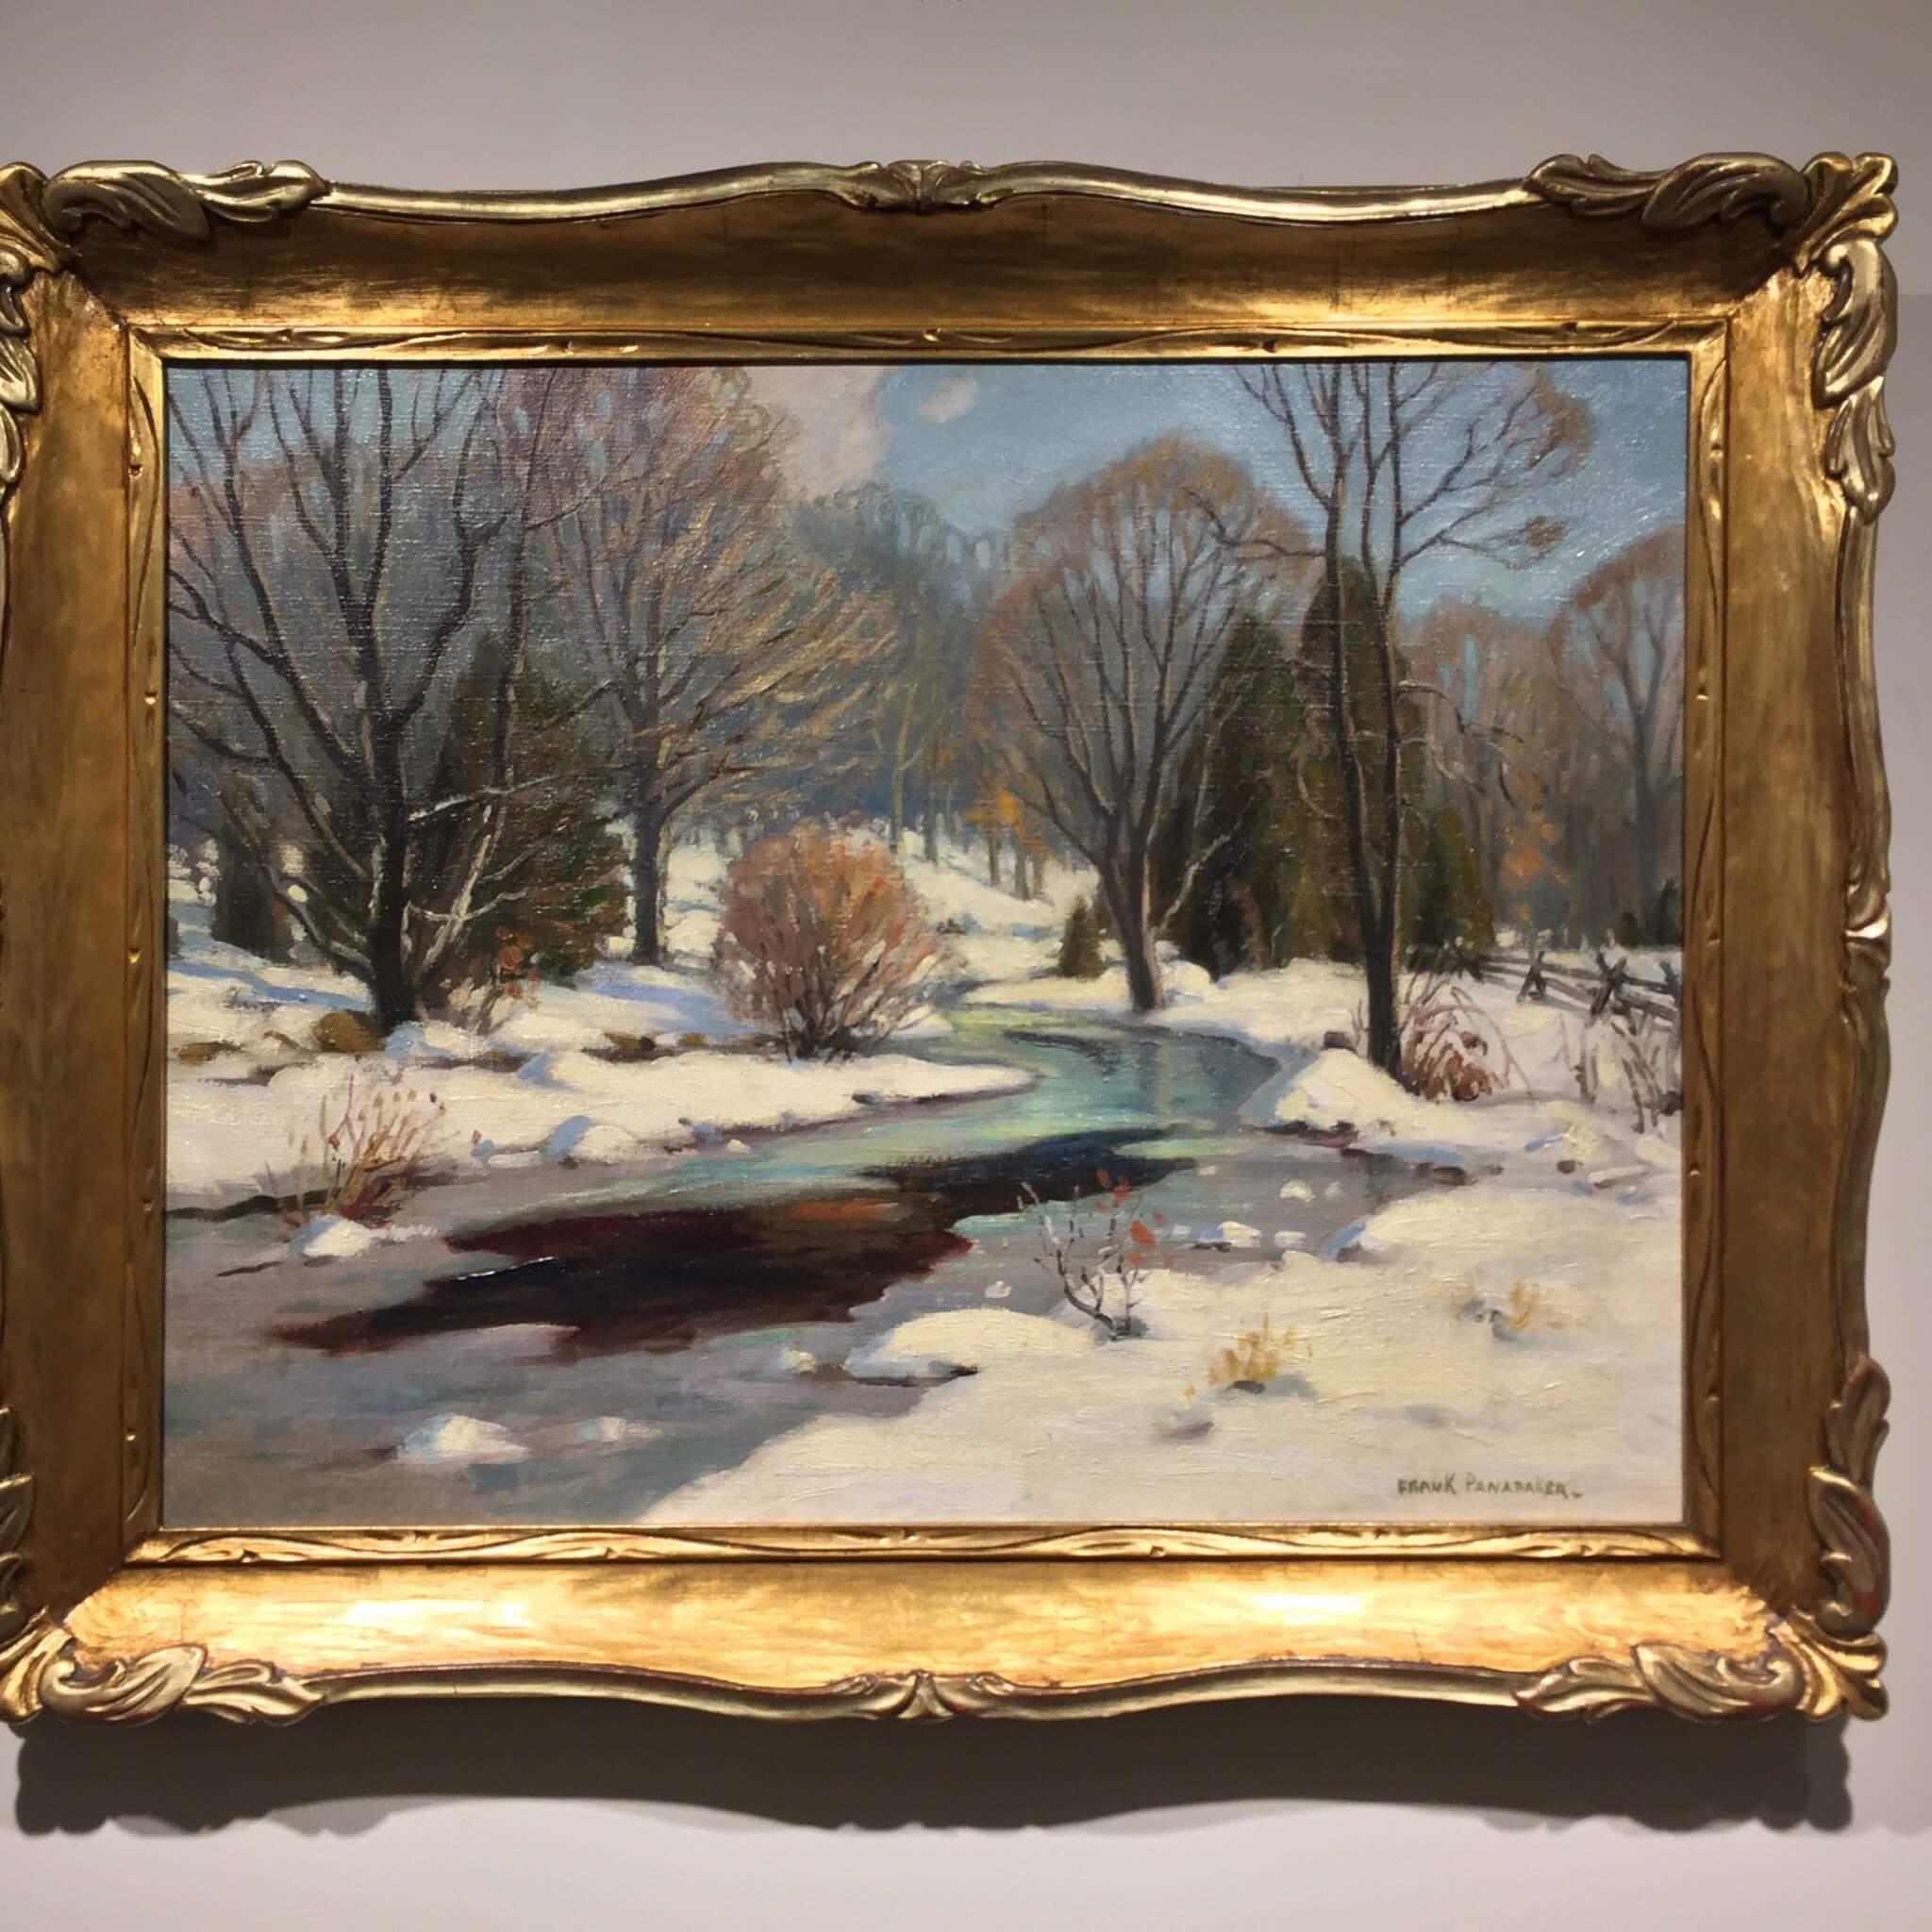 Frank Panabaker Onario Snowy Road 16x20 Framed